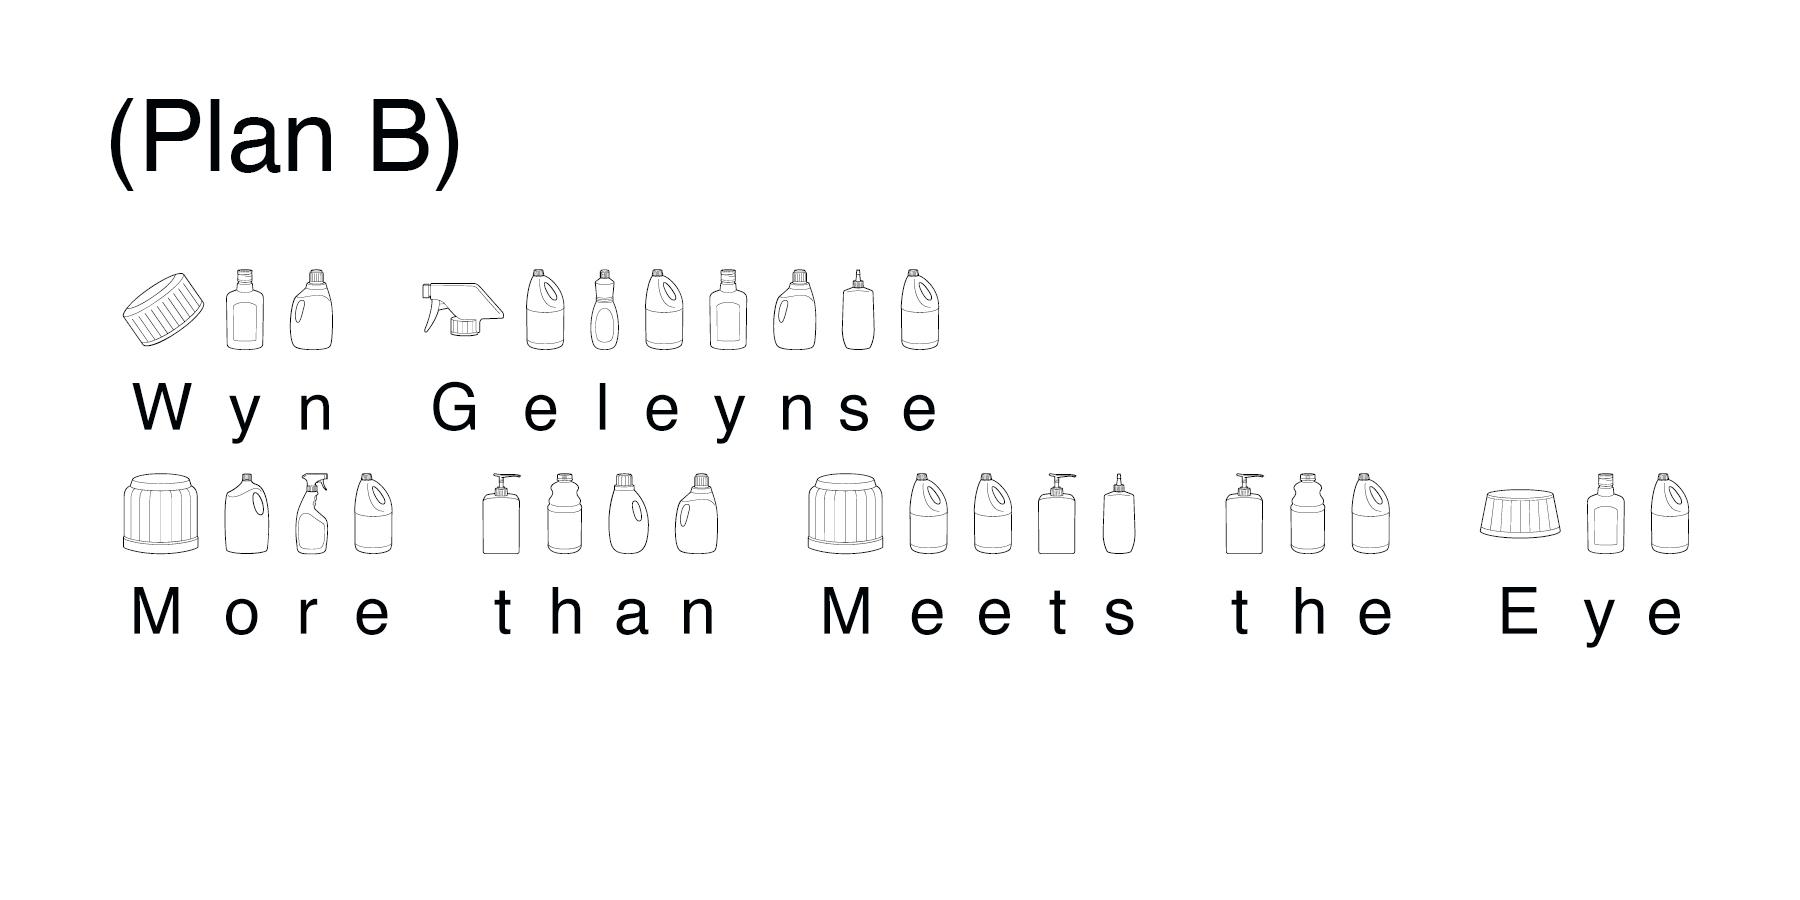 Wyn Geleynse: More than Meets the Eye